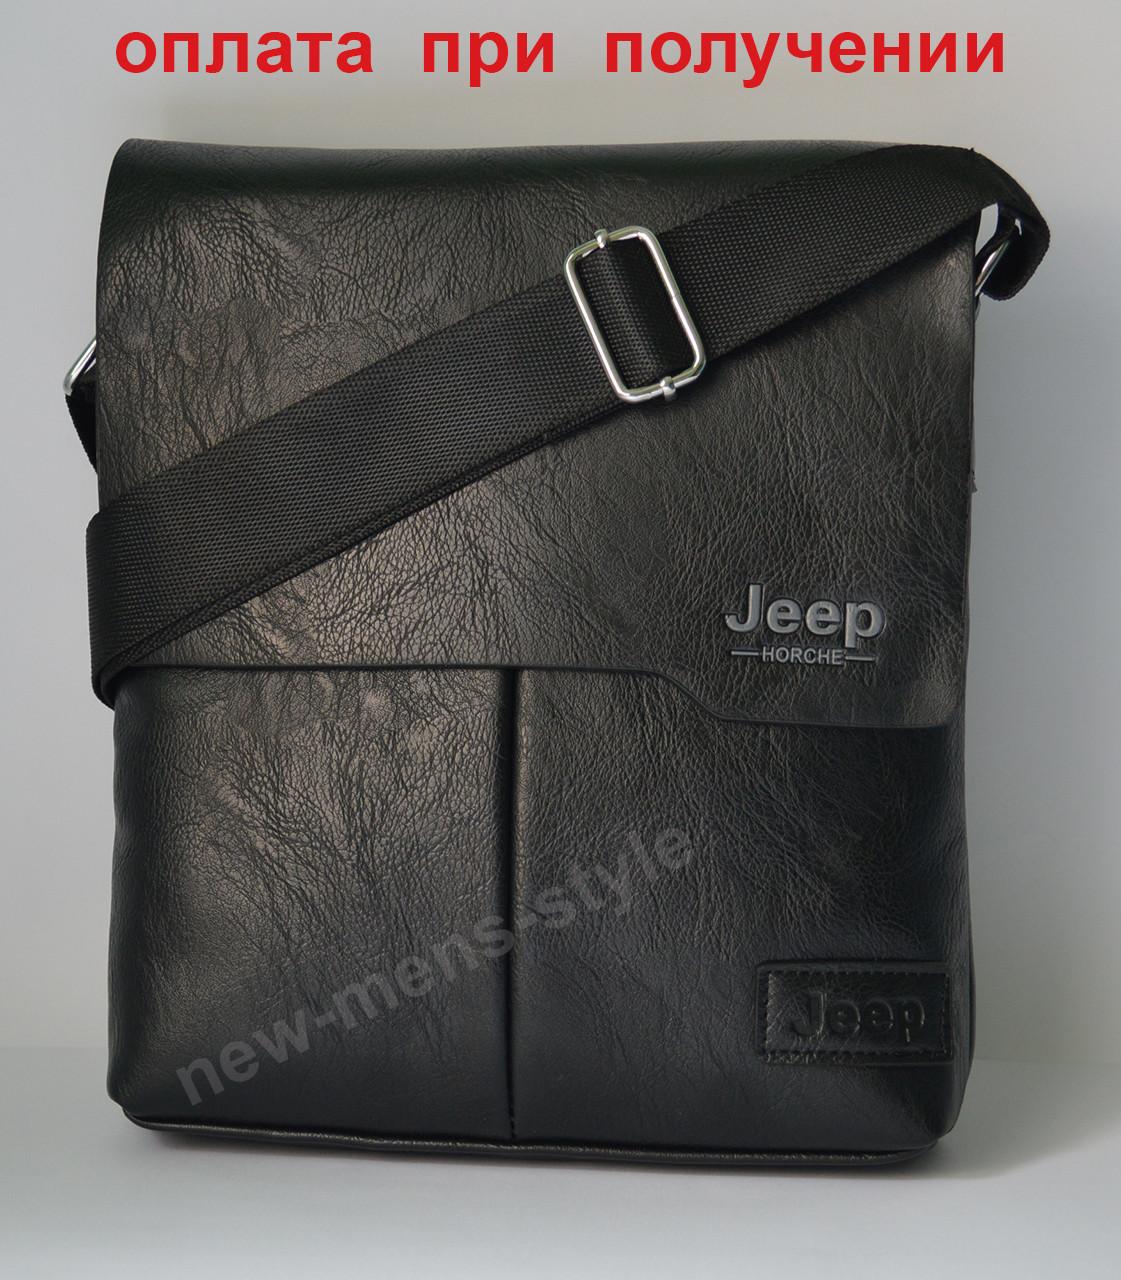 537b2c359be5 Мужская фирменная кожаная сумка через плечо Jeep buluo NEW!!! - Bigl.ua